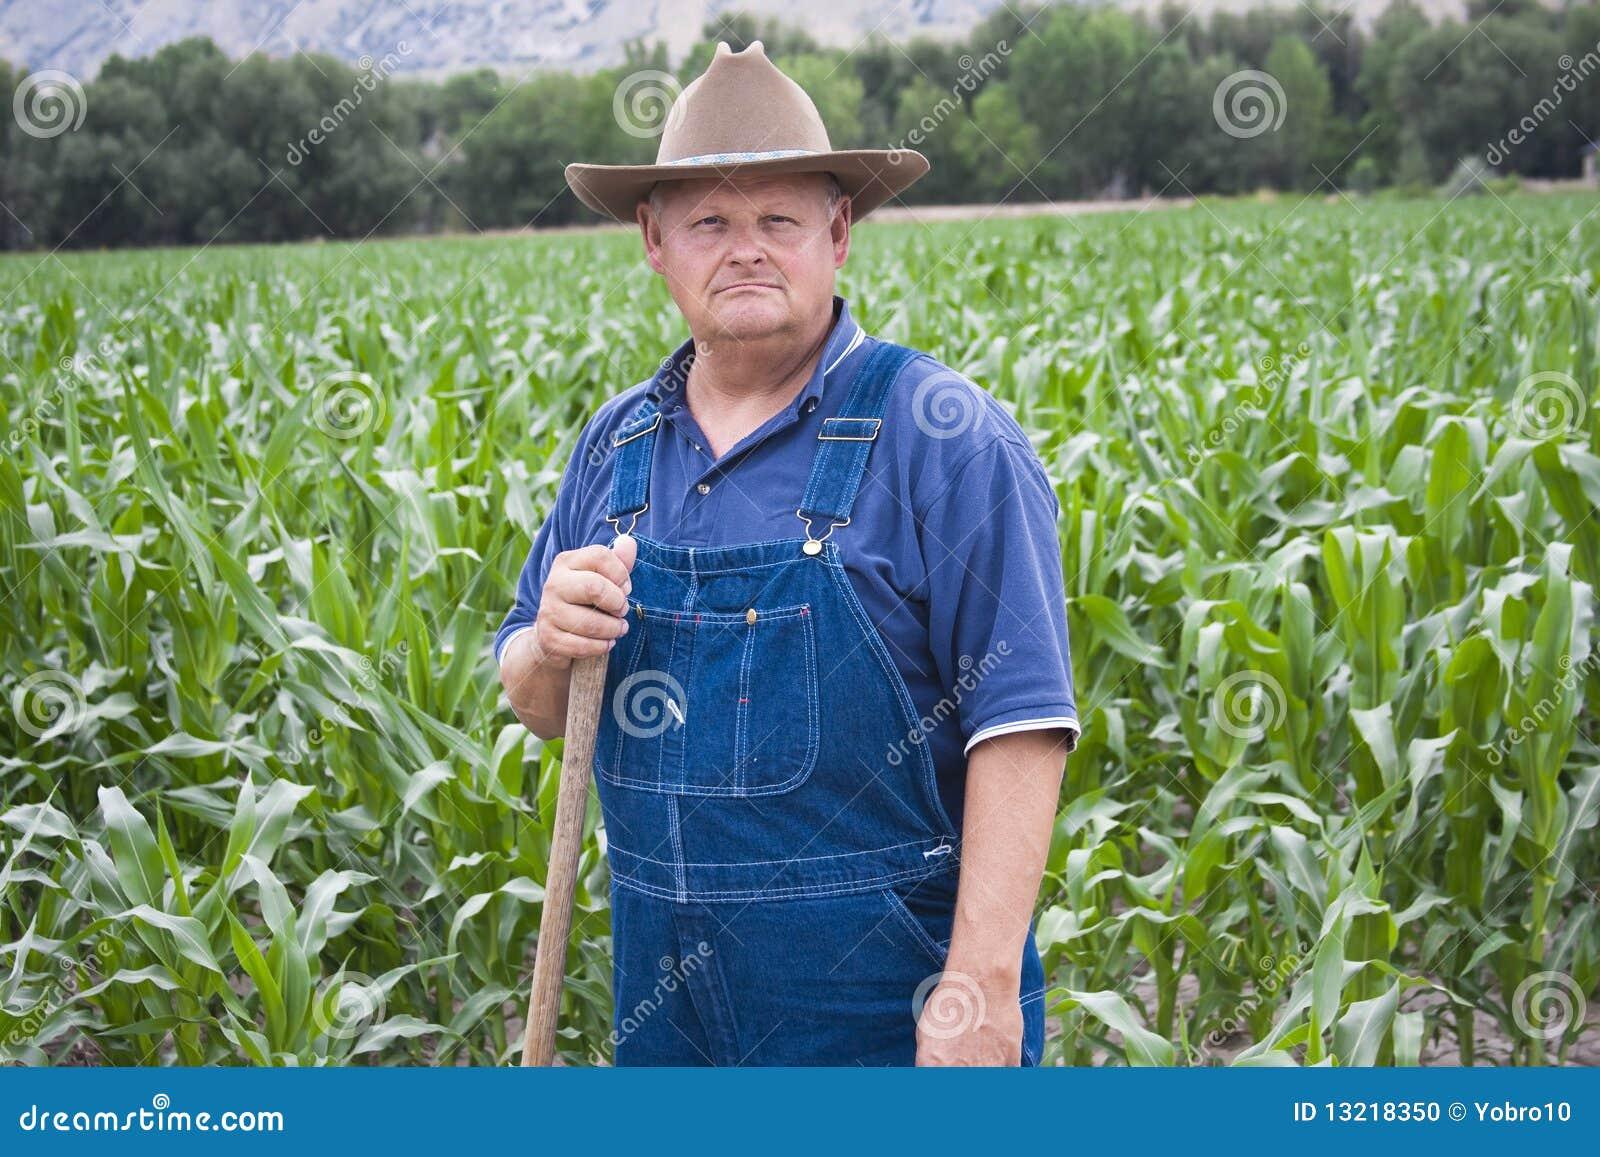 old farmer working in his fields stock photo image 13218350 bulldozer clipart free bulldozer clip art black & white